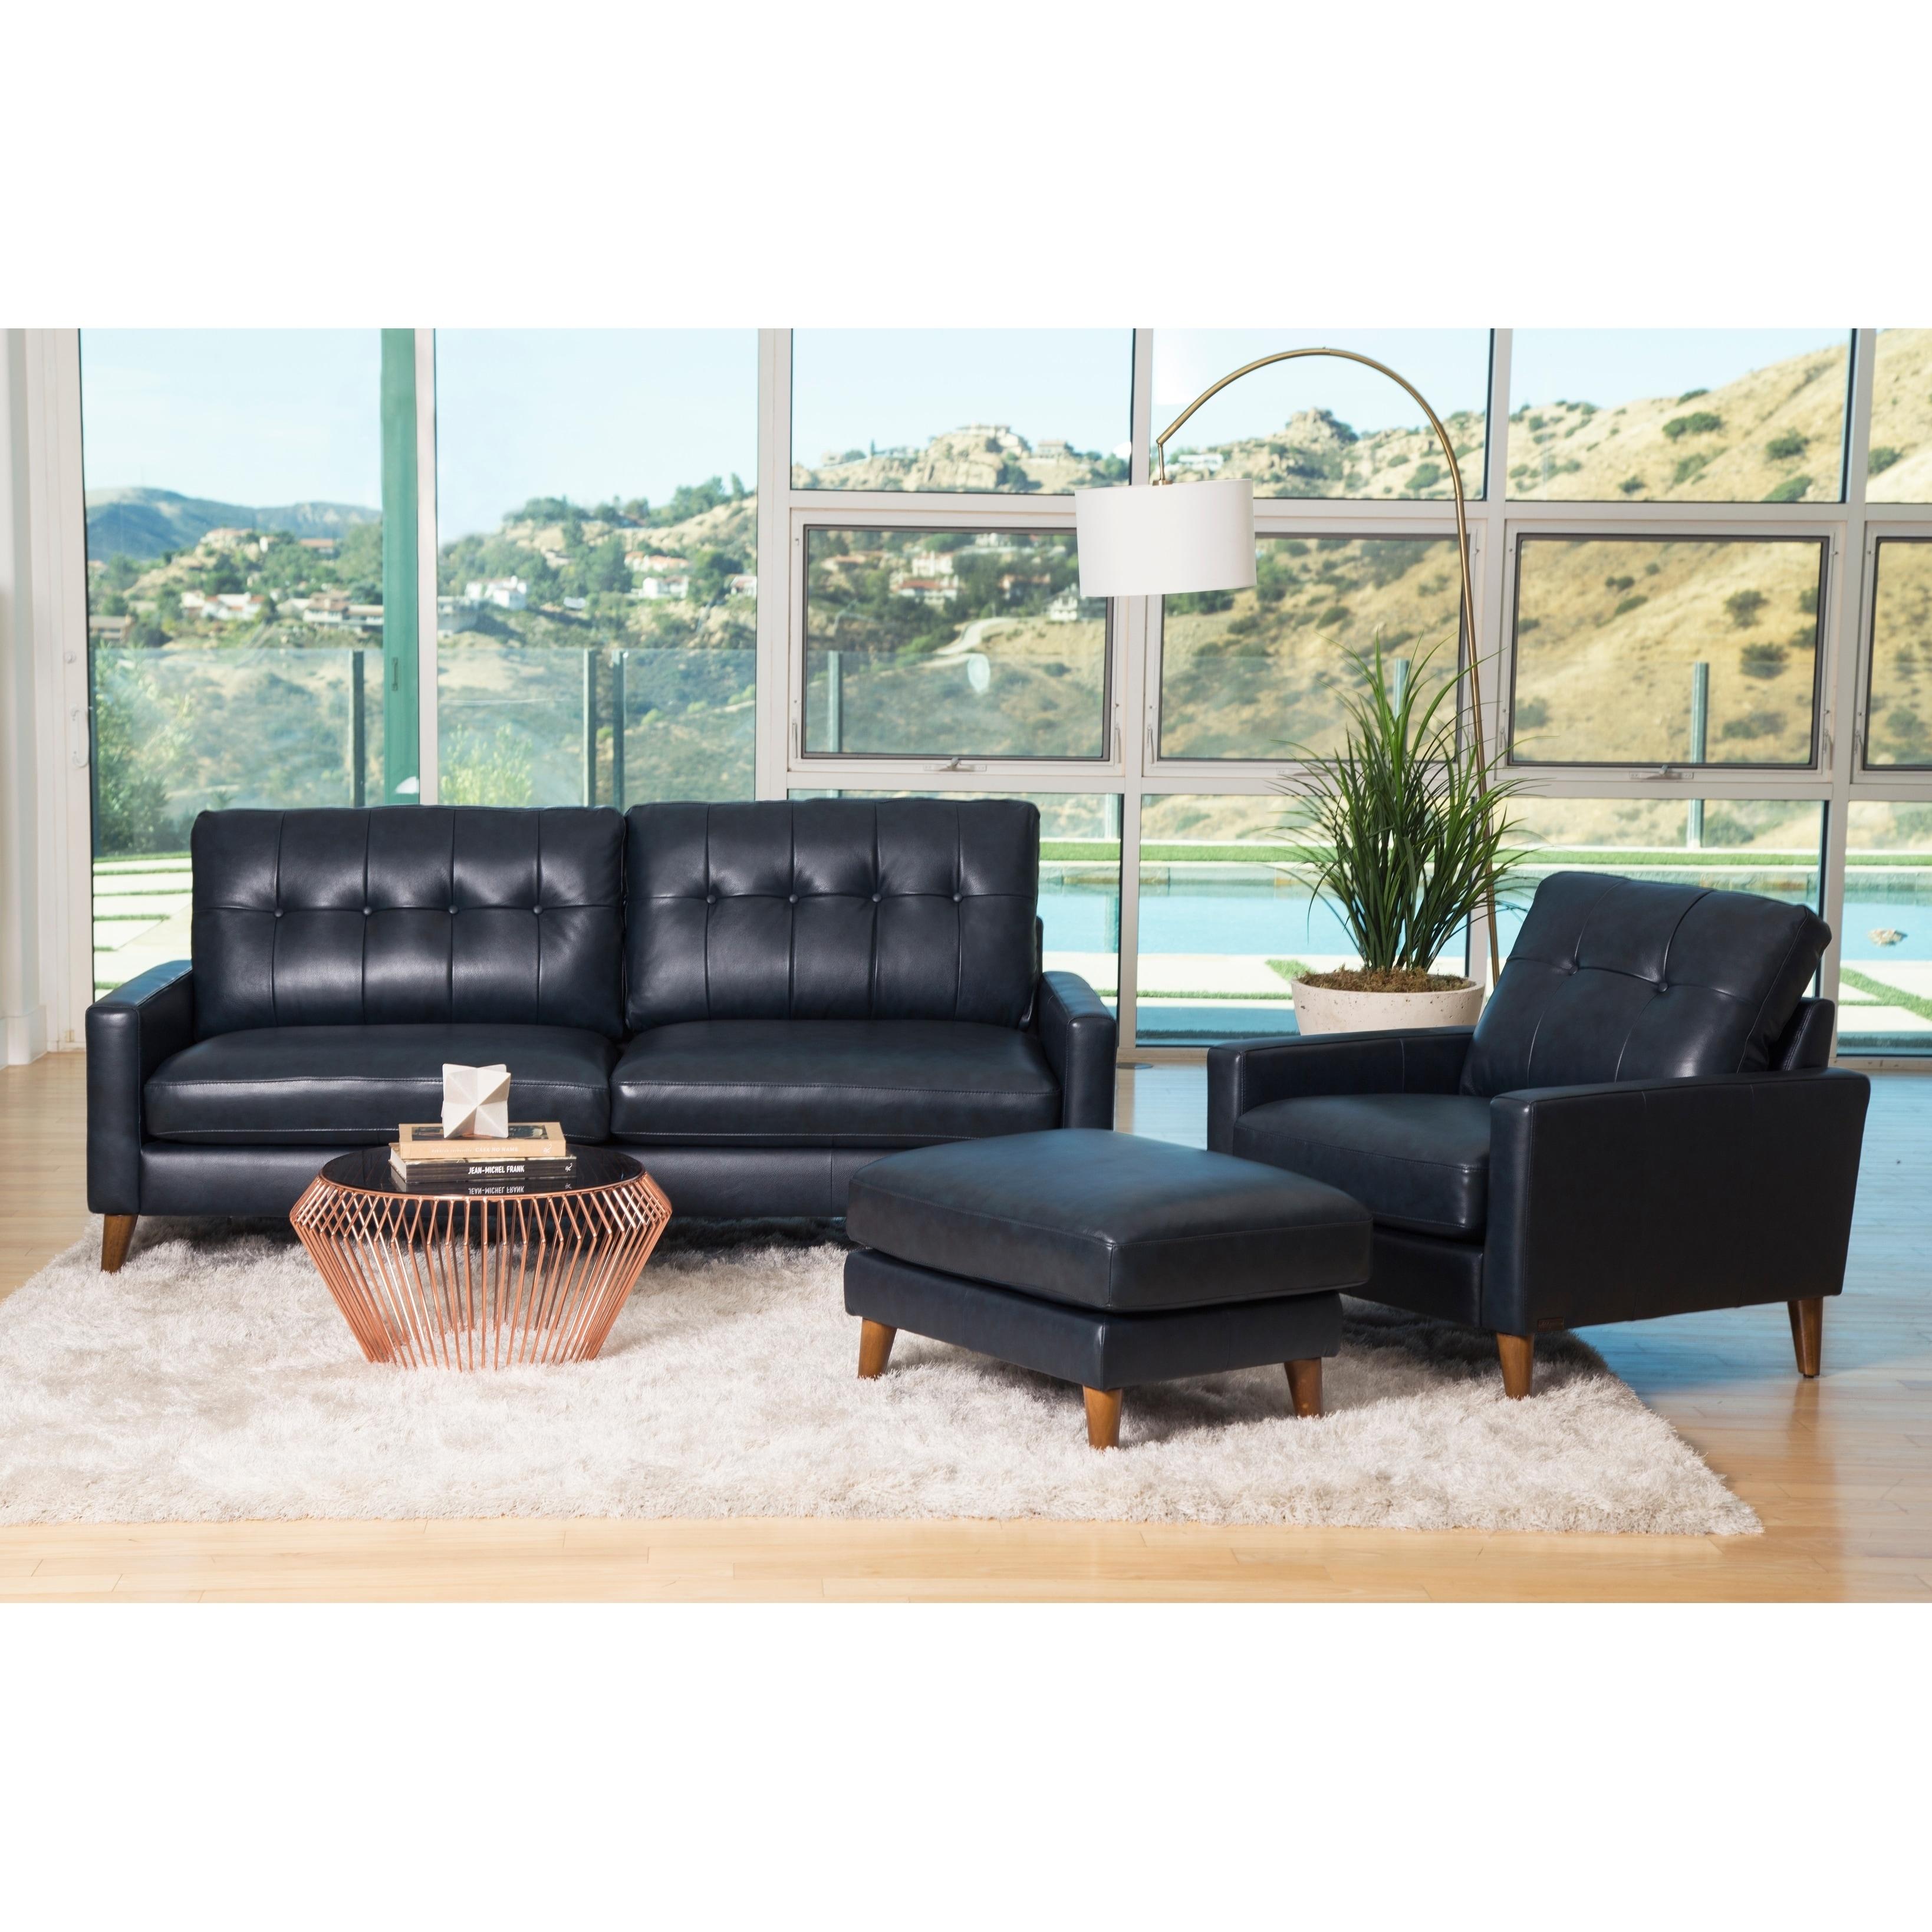 Abbyson Wright Mid Century Top Grain Leather 3 Piece Living Room ...